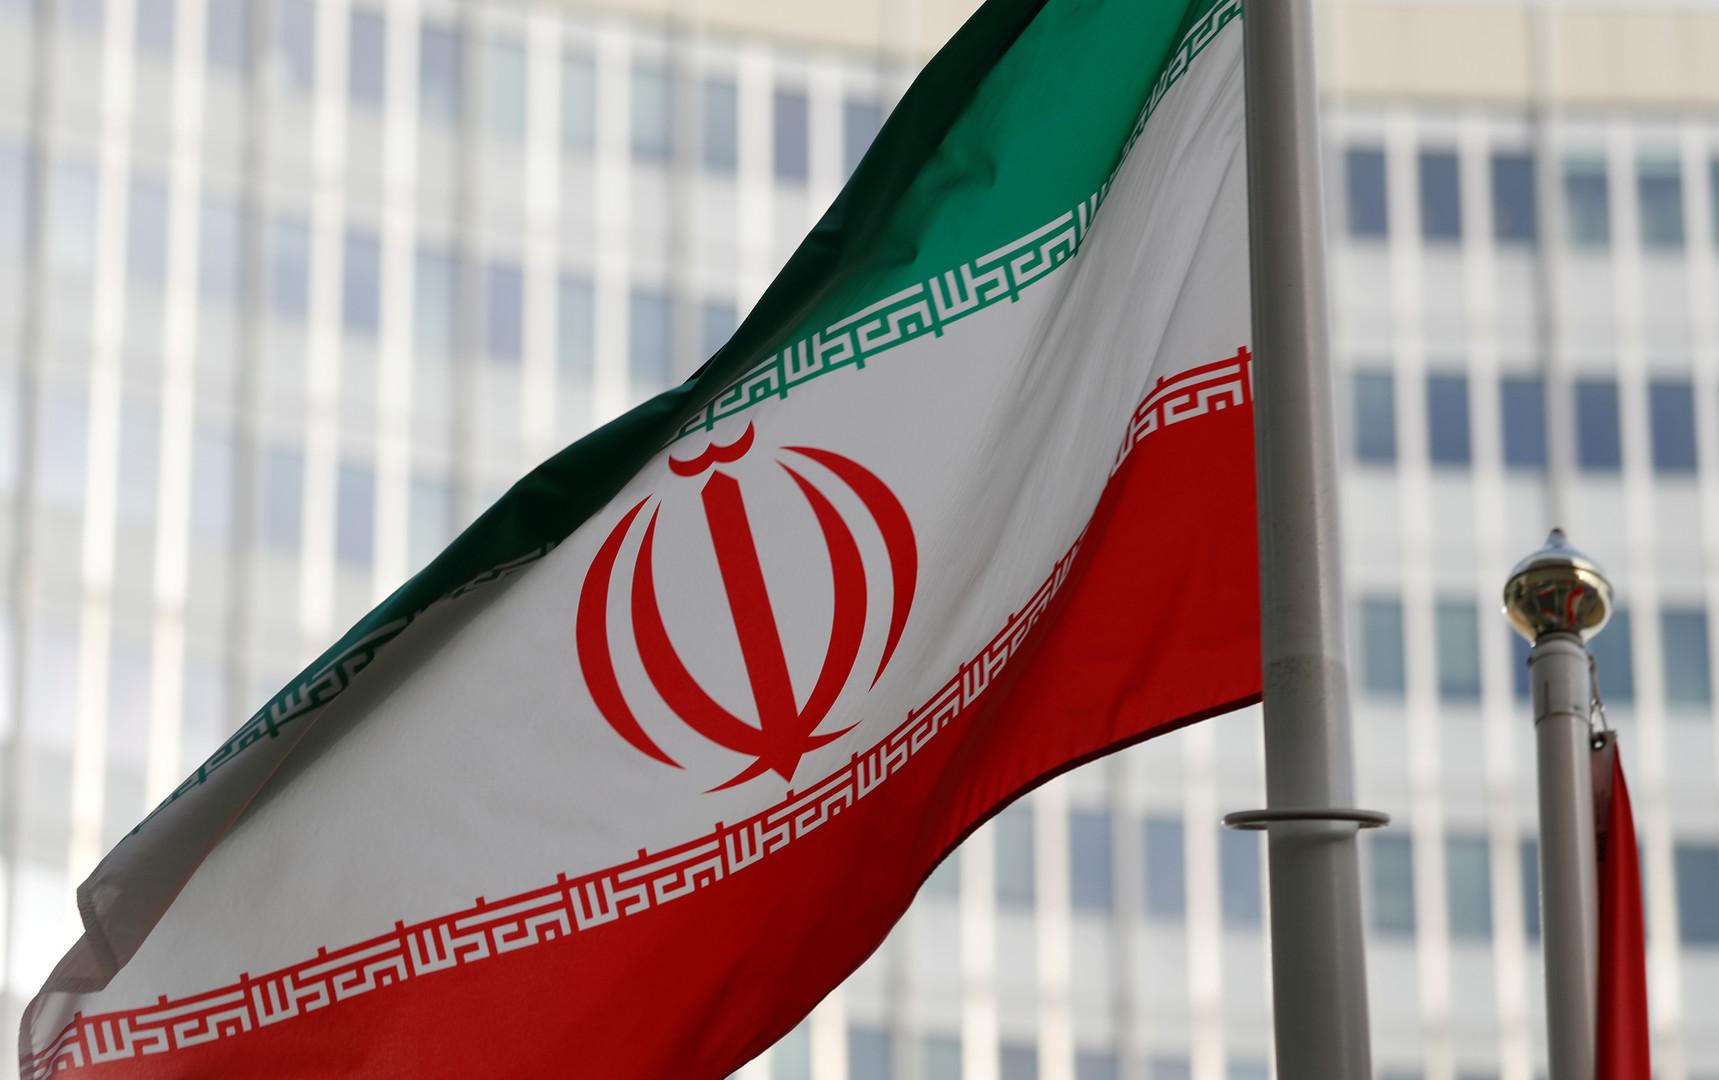 إيران تحذر داعمي عقوباتها وتؤكد أنها لن تنسى من يعاديها